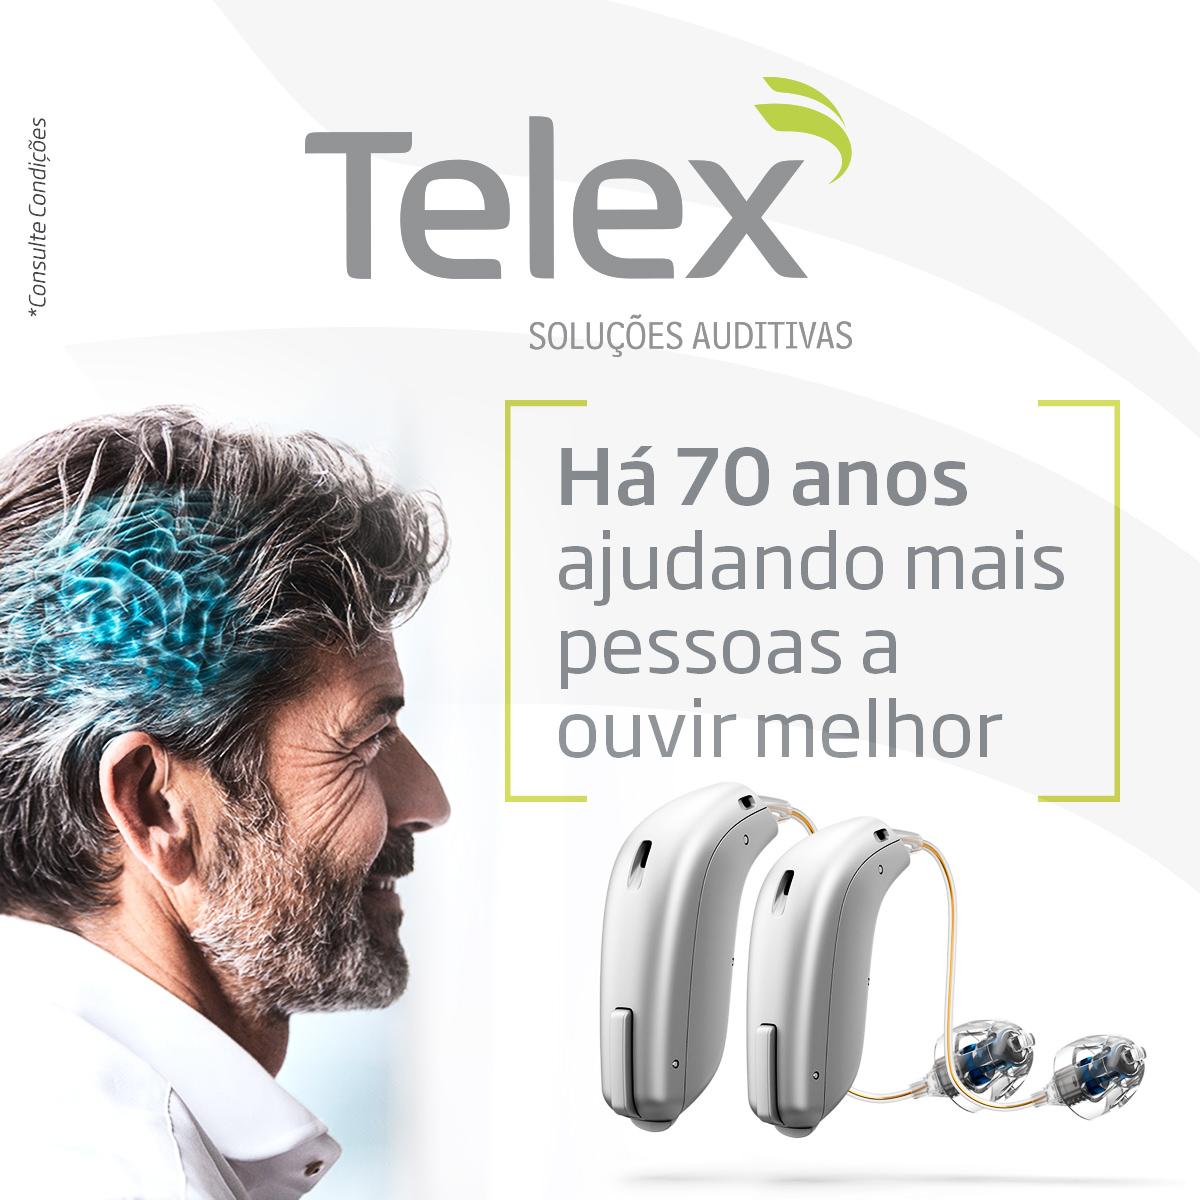 Banner Telex MG